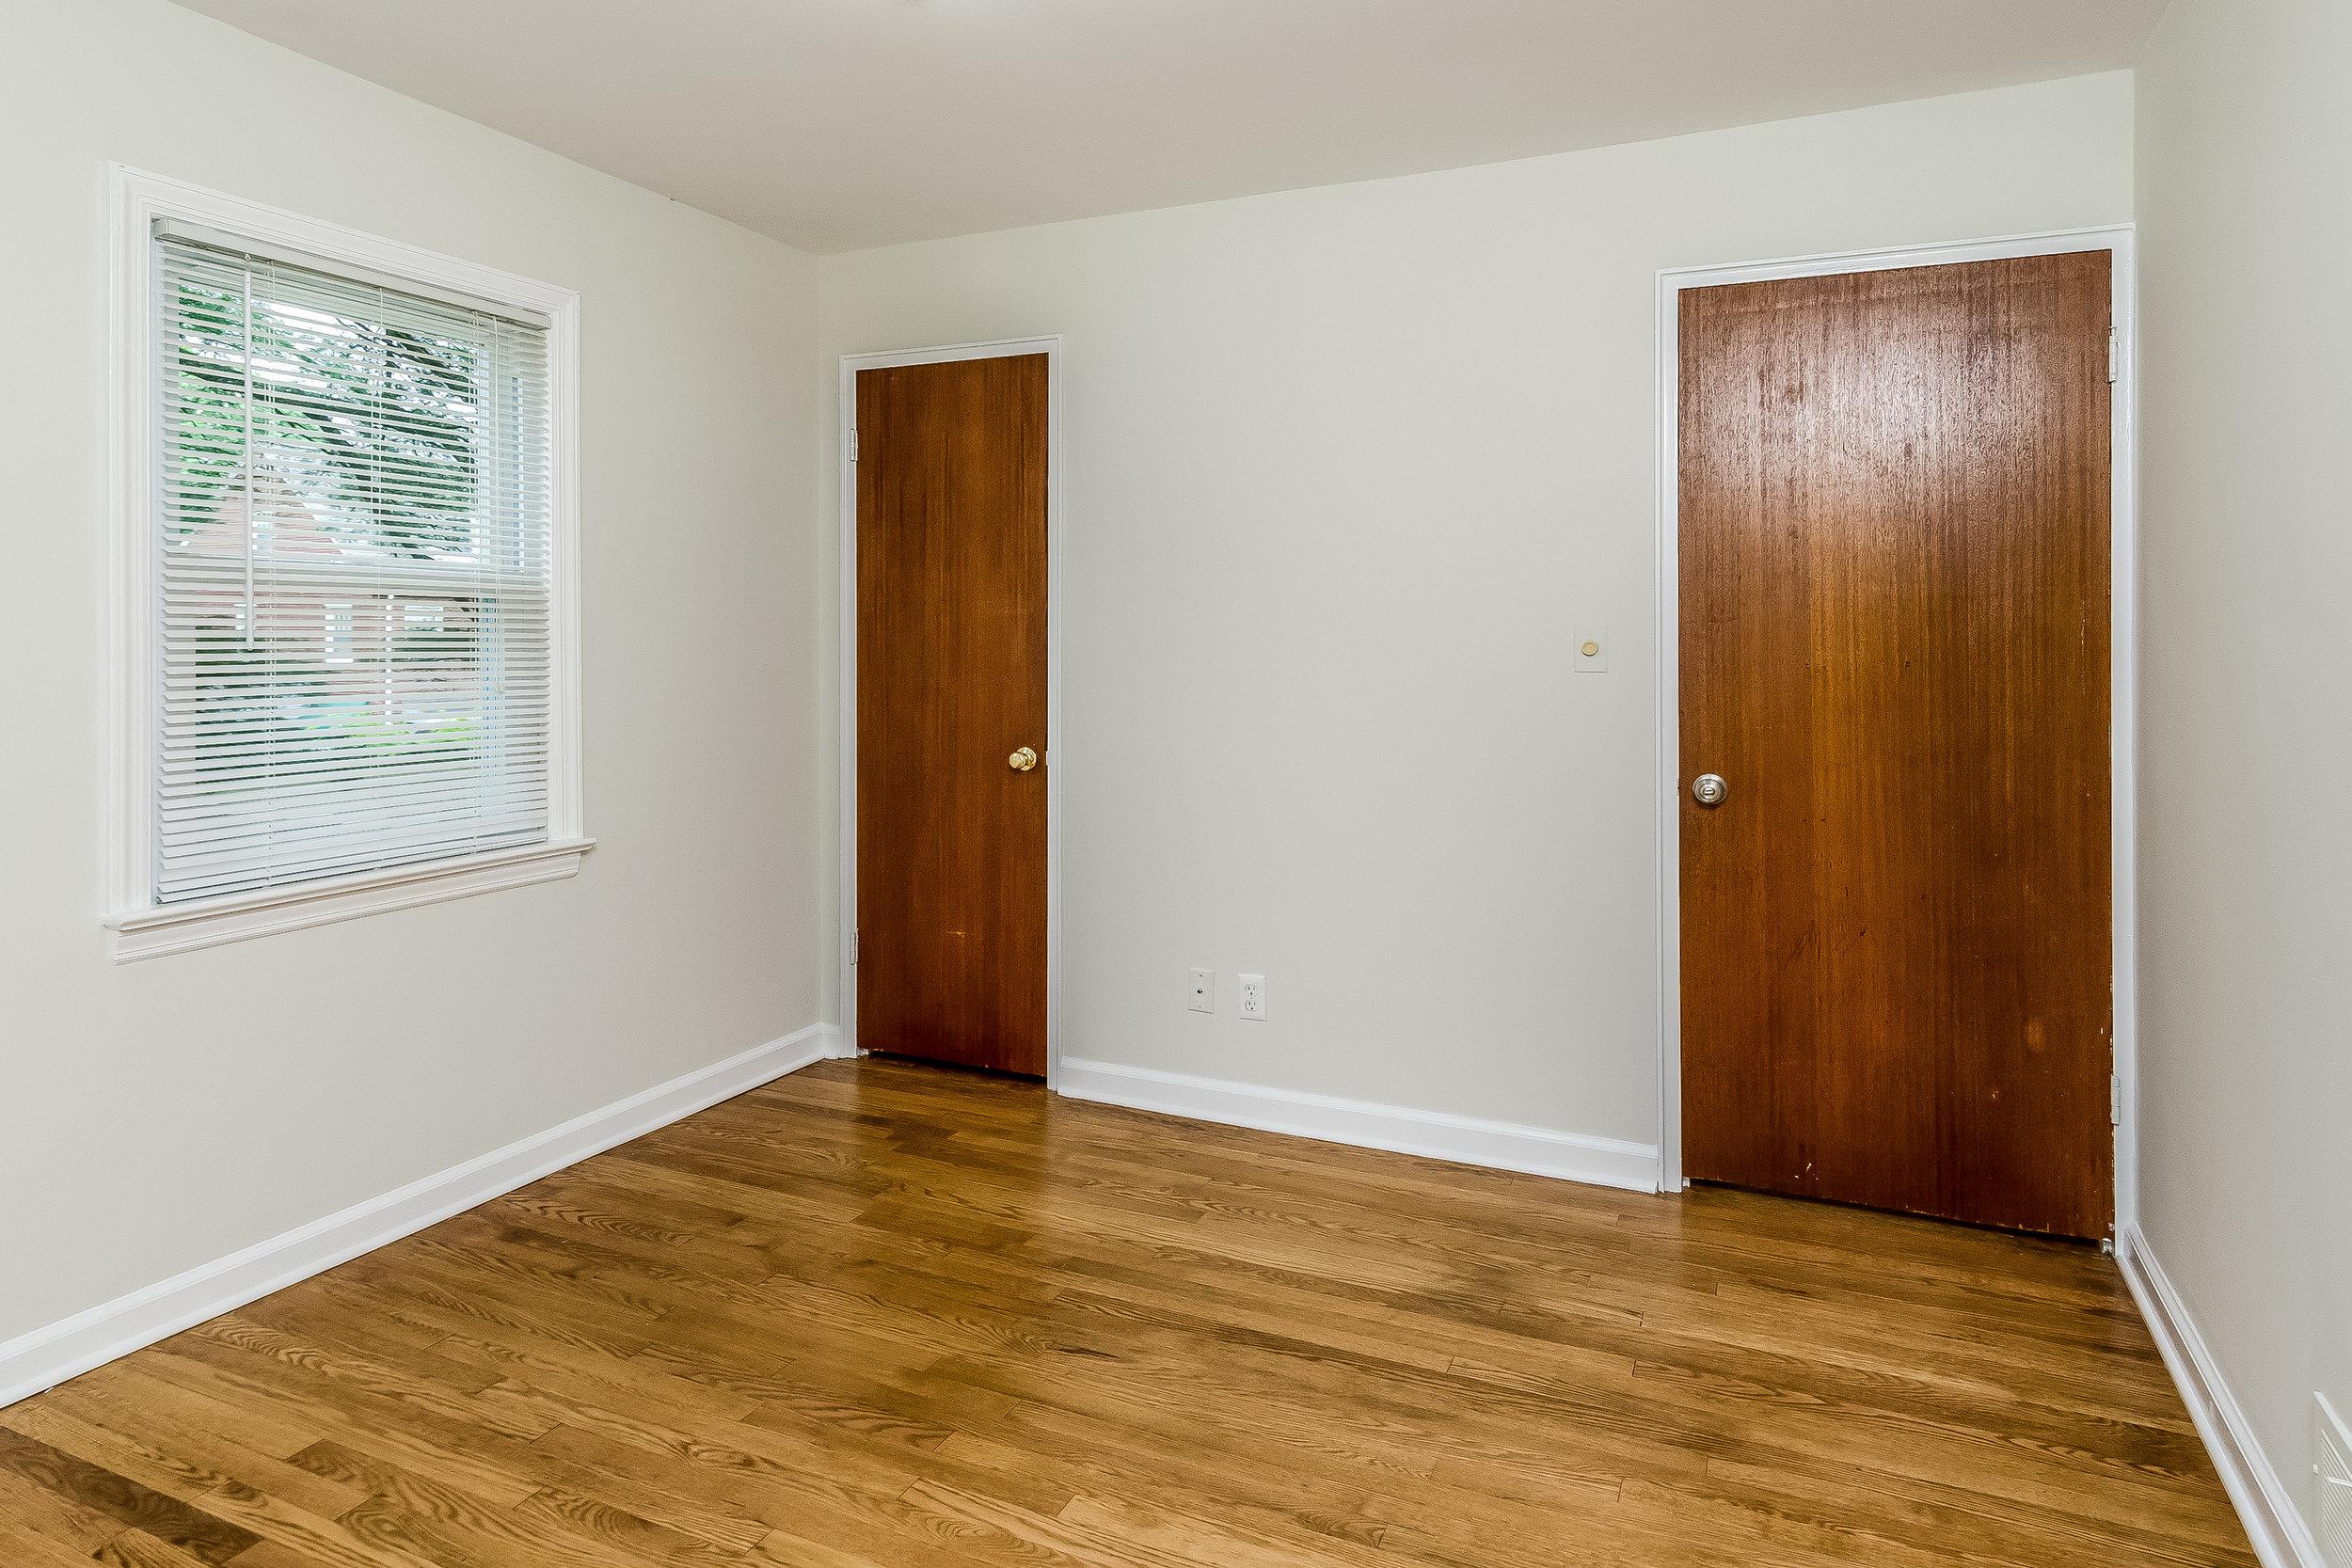 018-photo-bedroom-5786540.jpg